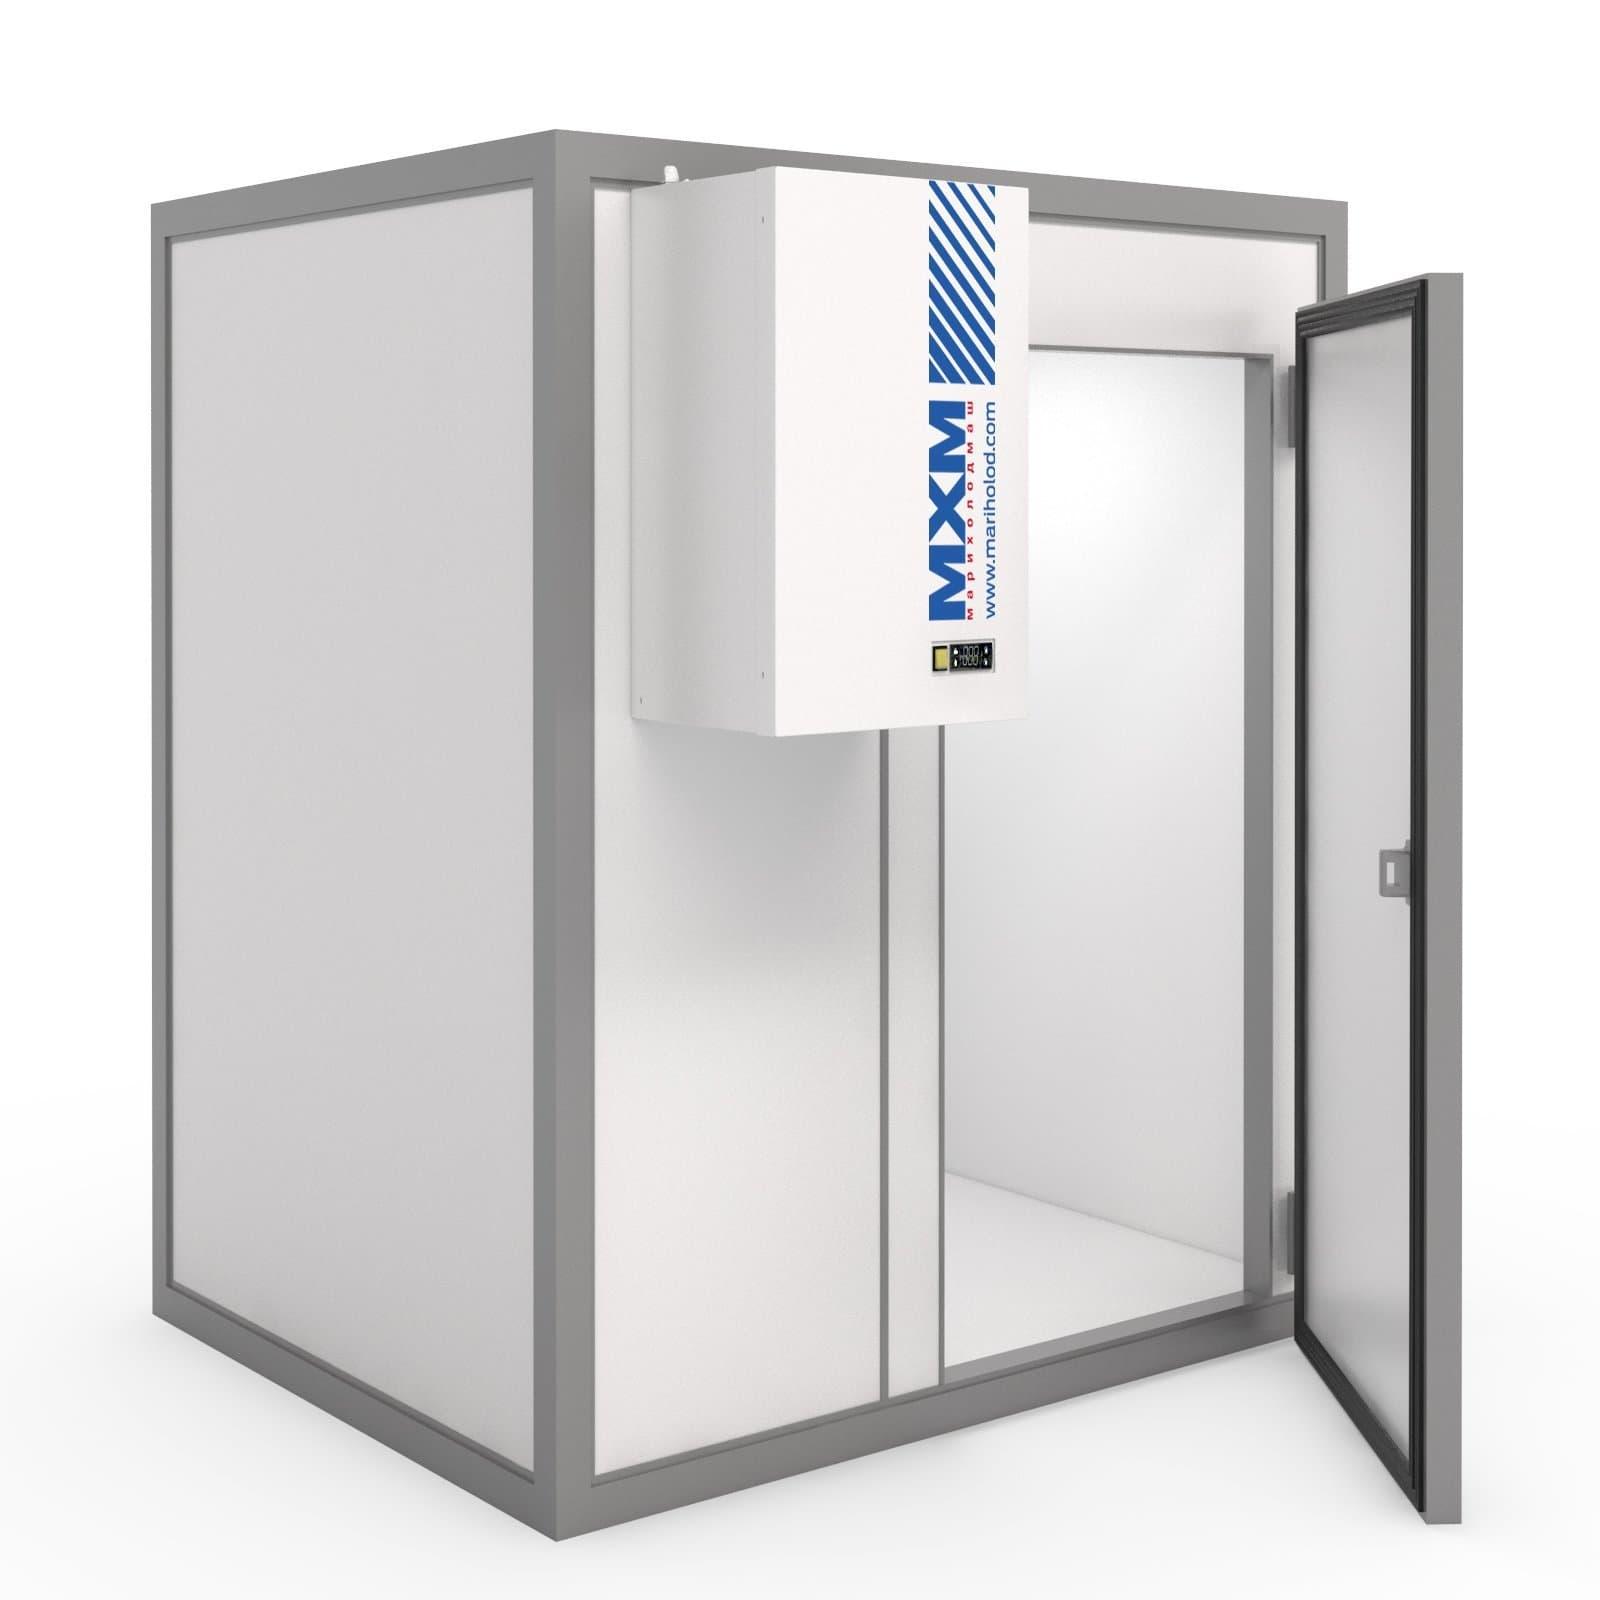 Камера холодильная МХМ КХН-11,59 1360×4360×2460